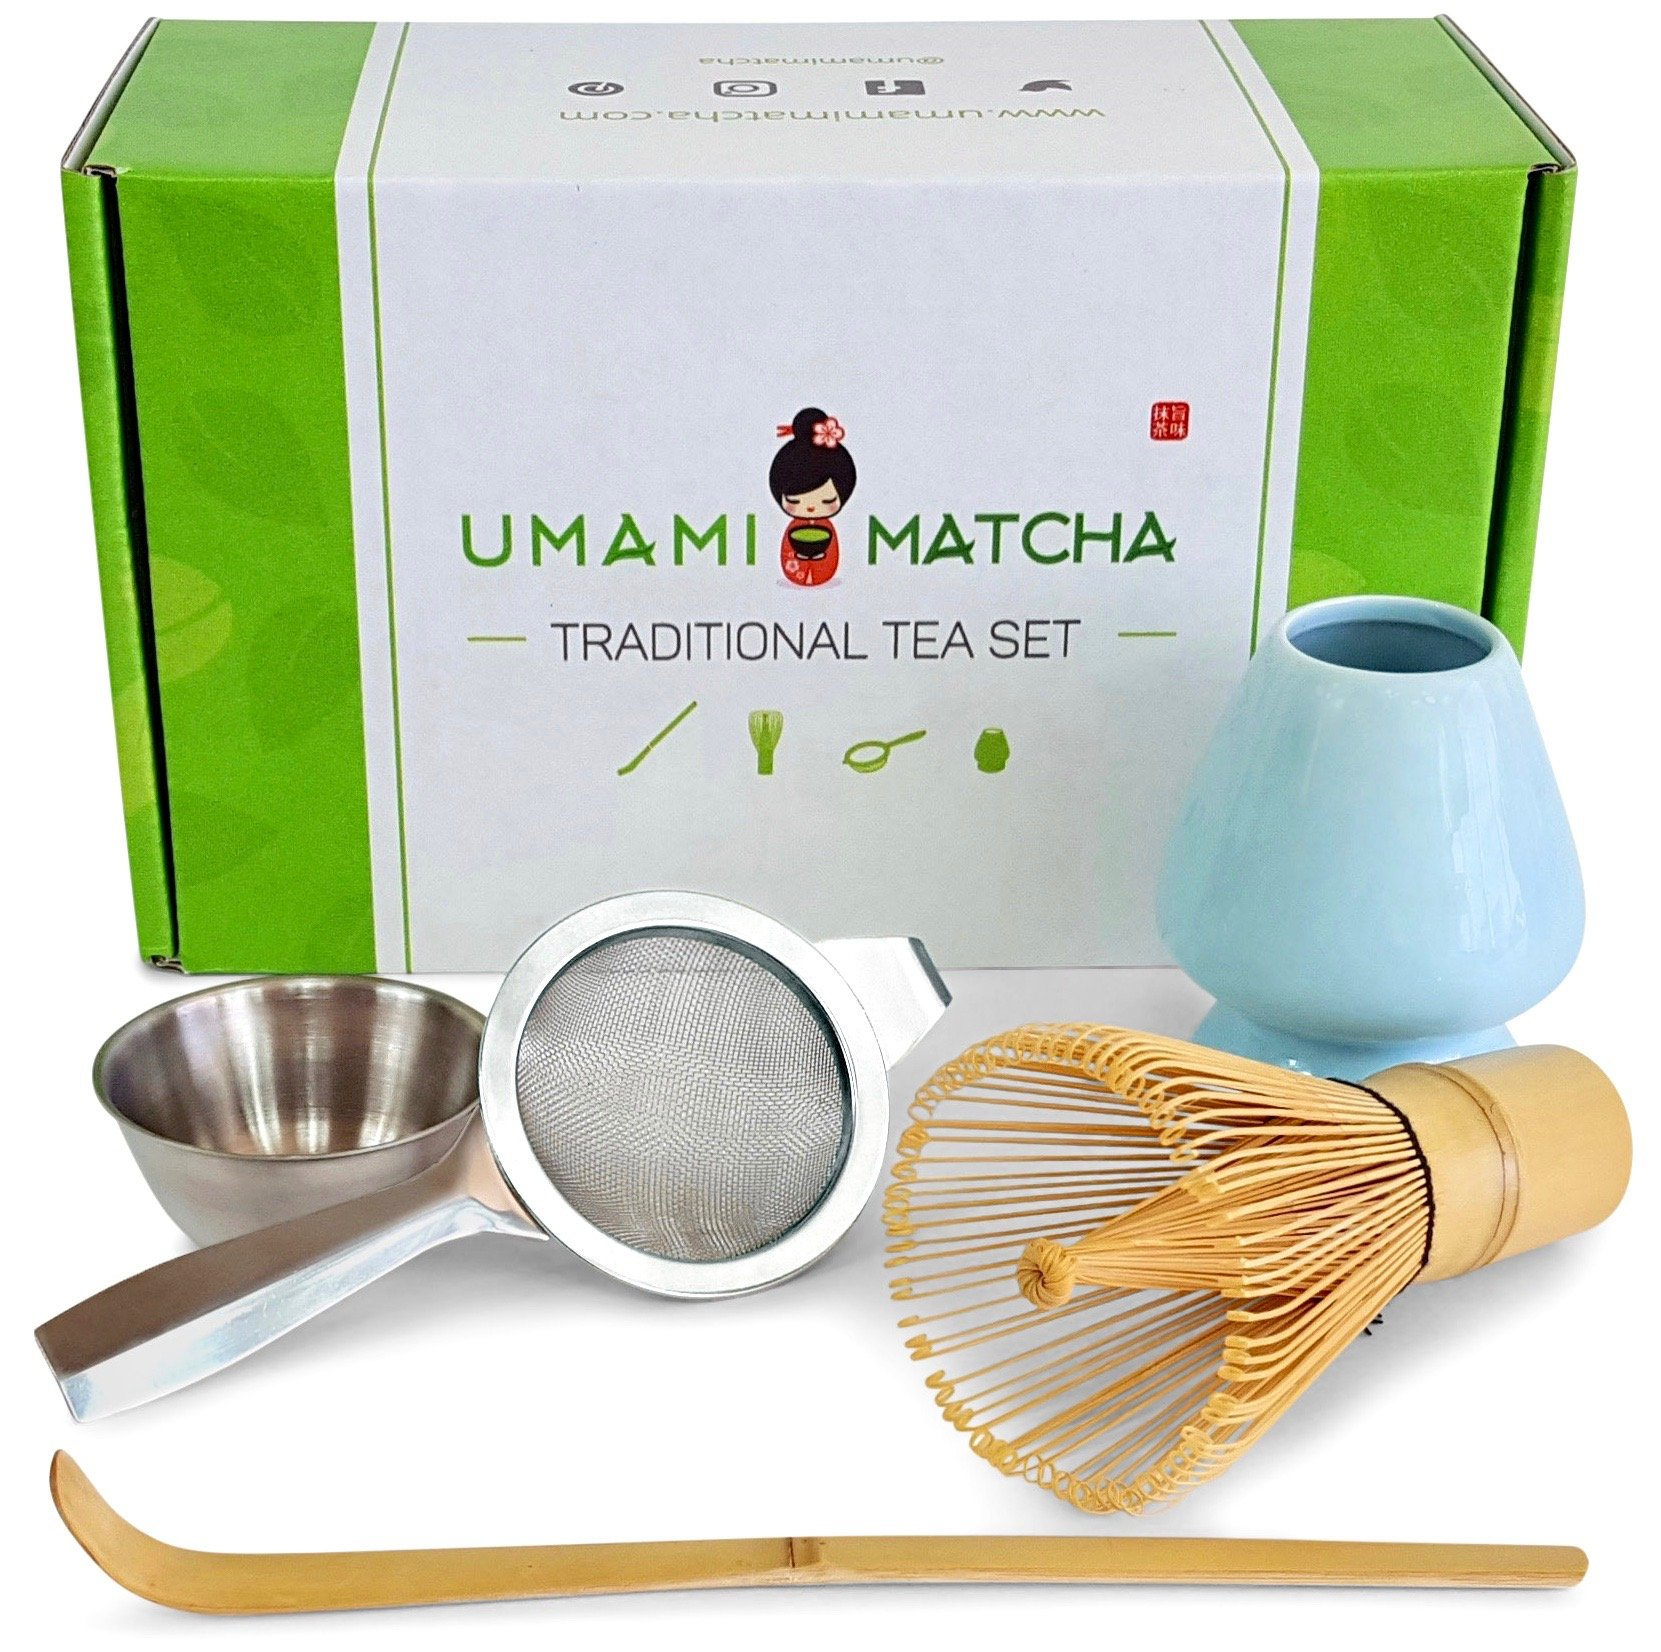 UMAMI MATCHA Tea Set   Traditional Bamboo Matcha Whisk & Scoop   Stainless Steel Sifter   Ceramic Blue Whisk Holder   Best Authentic Matcha Kit For Japanese Matcha Green Tea Ceremony by UMAMI MATCHA